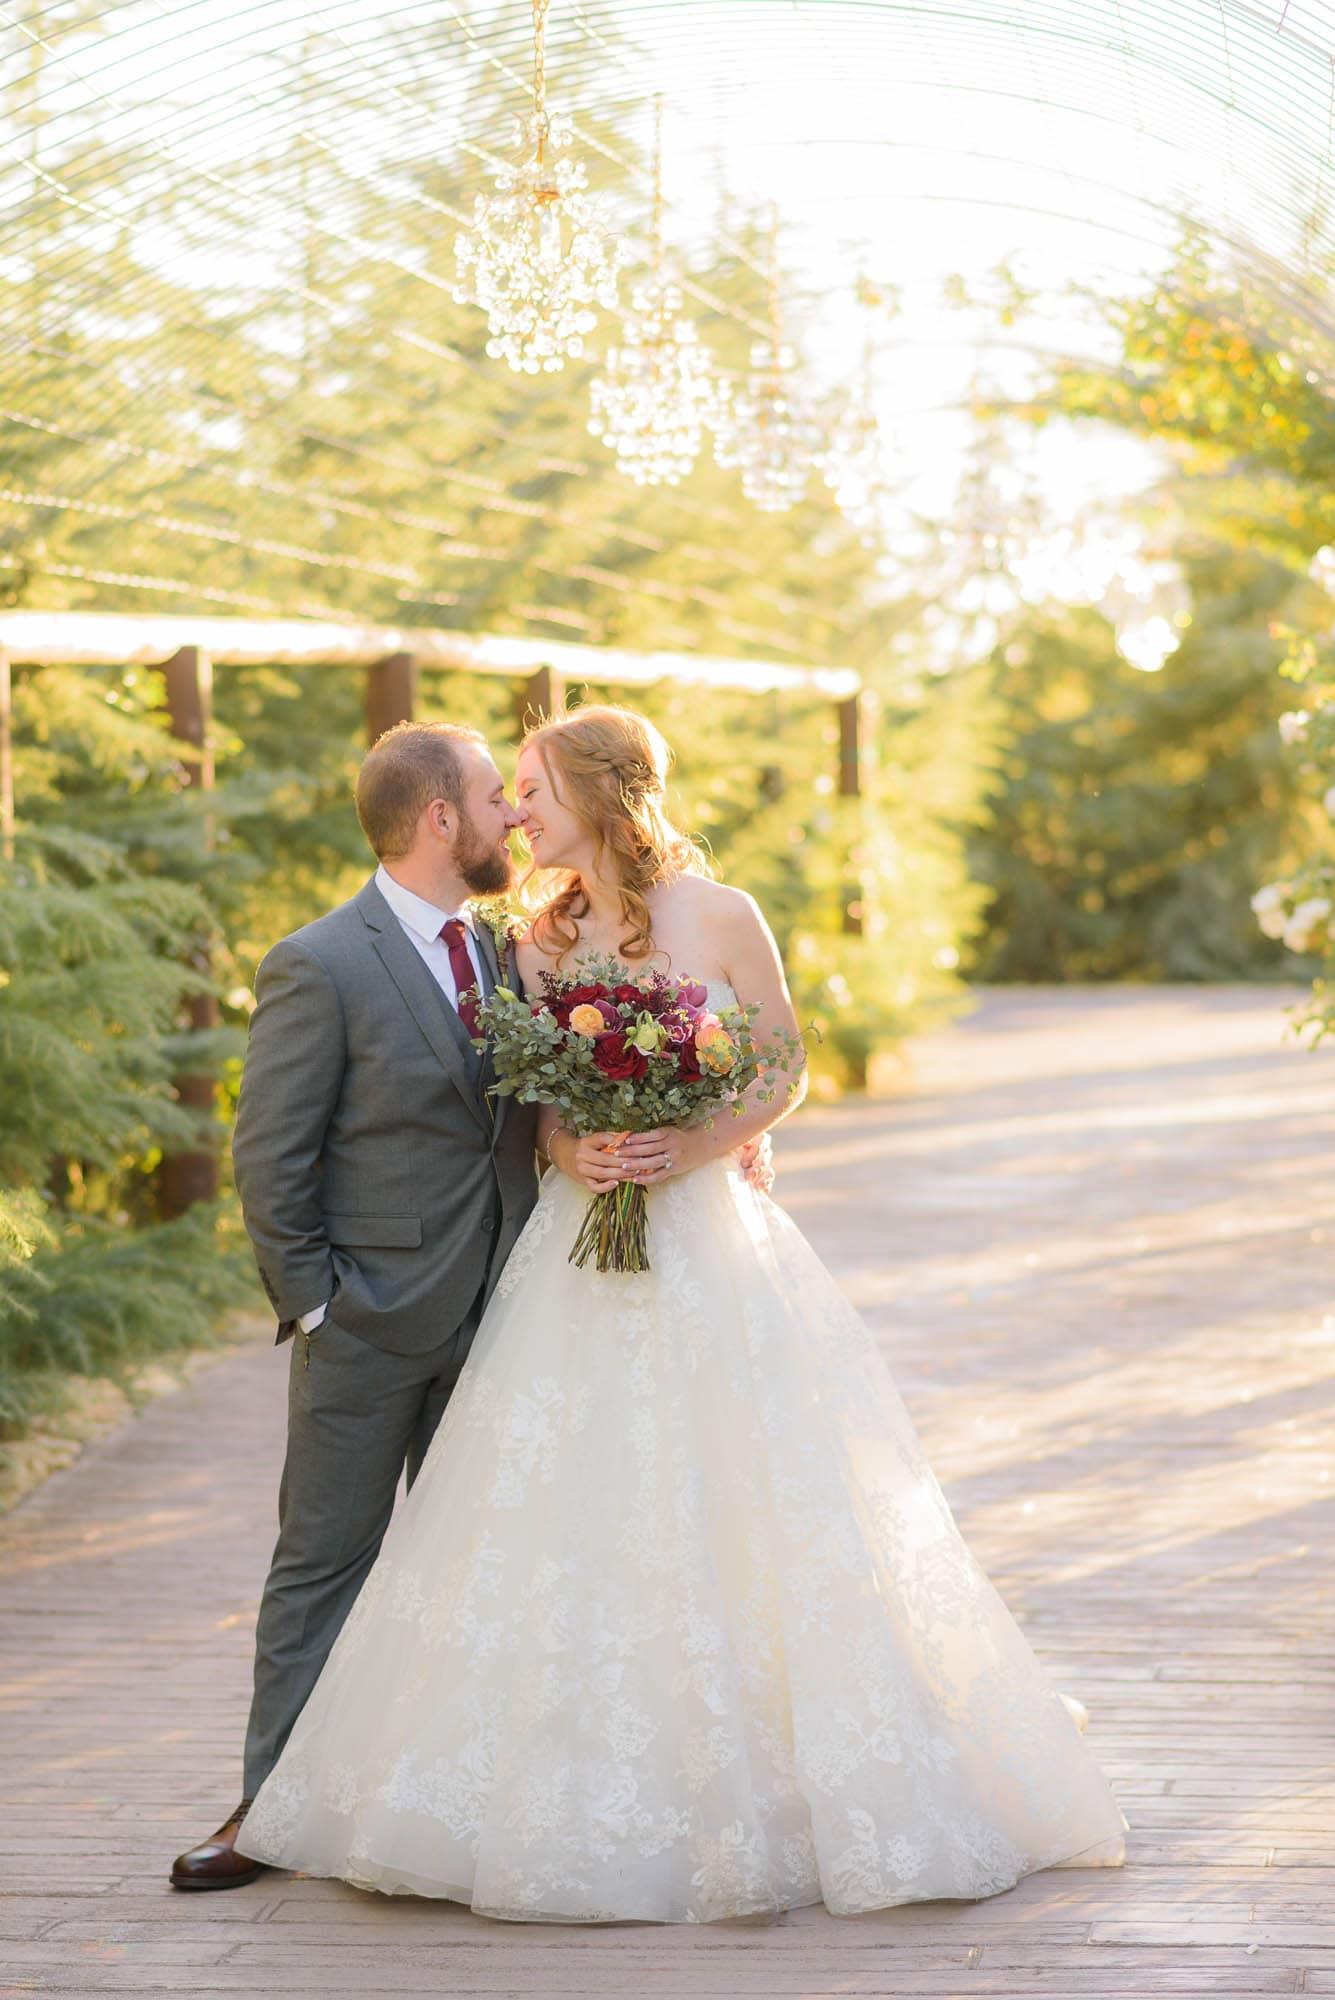 434_Alan_and_Heidi_Serendipity_Garden_Wedding_10-27-2018